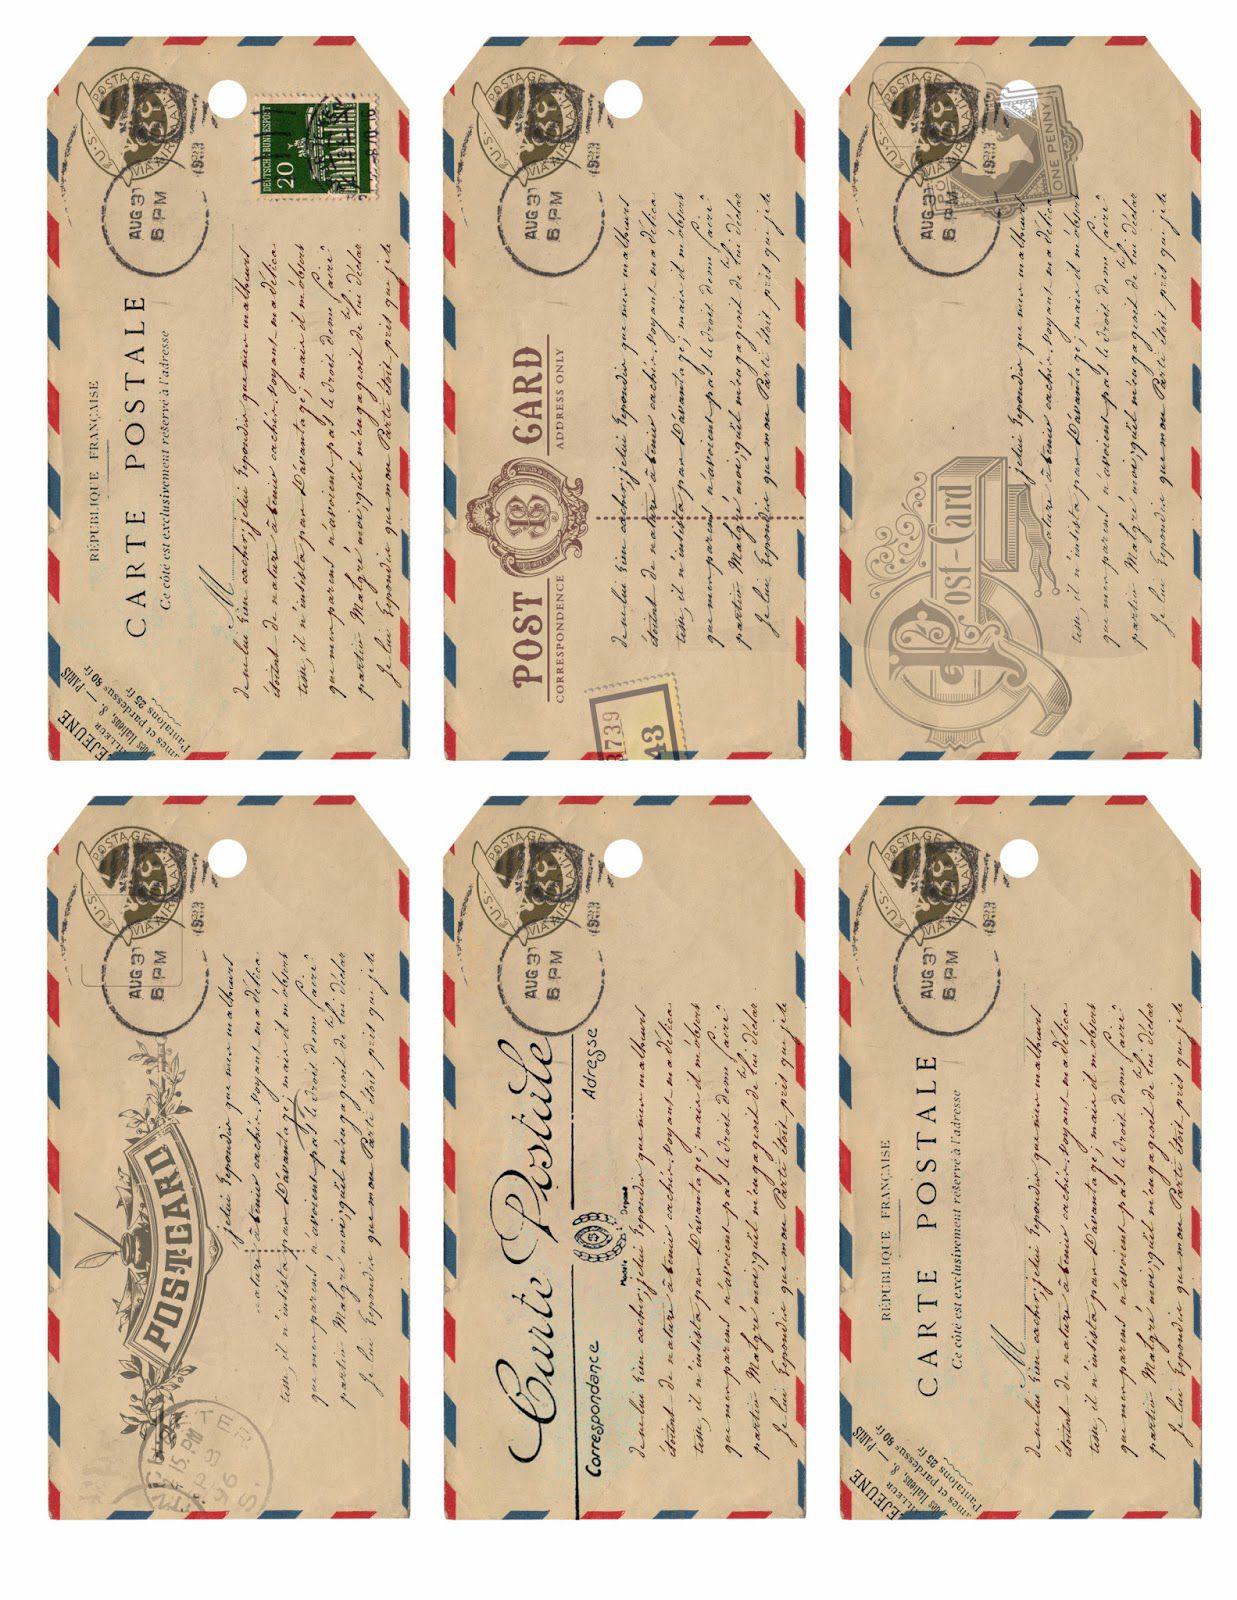 10 Free Printable Gift Tag Templates And Designs - Free Printable Vintage Christmas Tags For Gifts